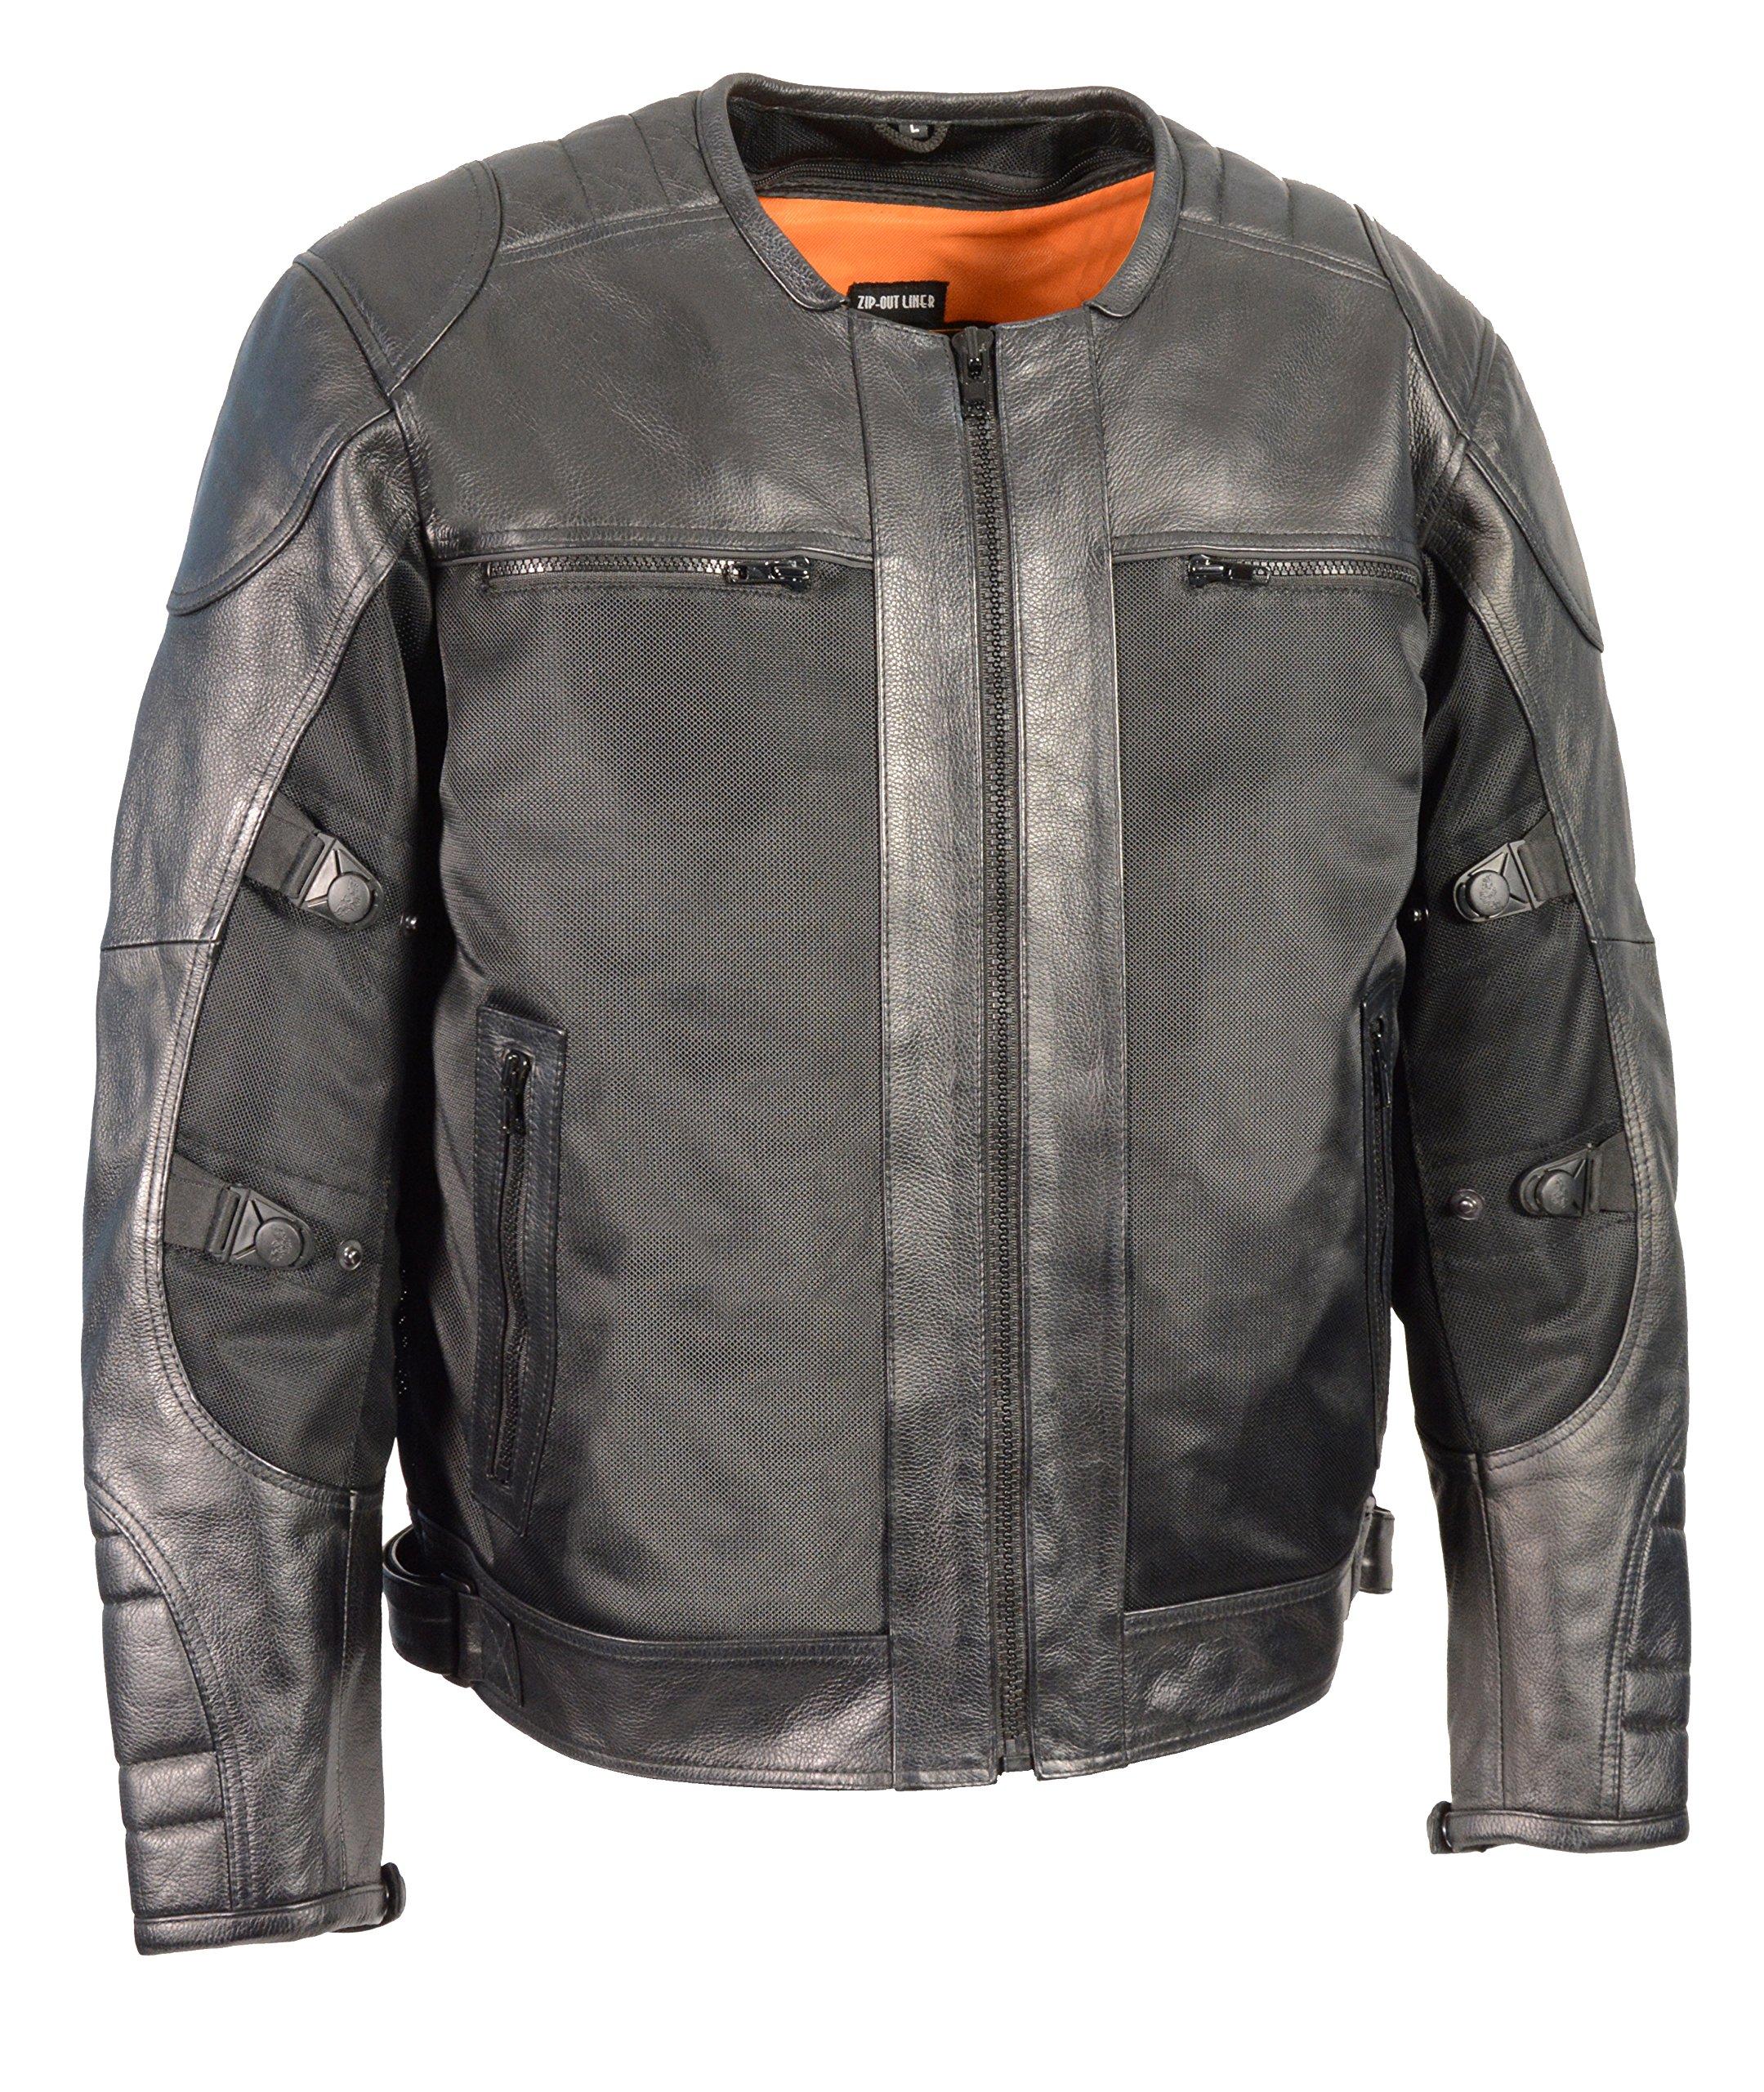 Milwaukee Performance Men's Mesh/Leather Combo Scooter Sports Jacket (Black, 4X-Large)